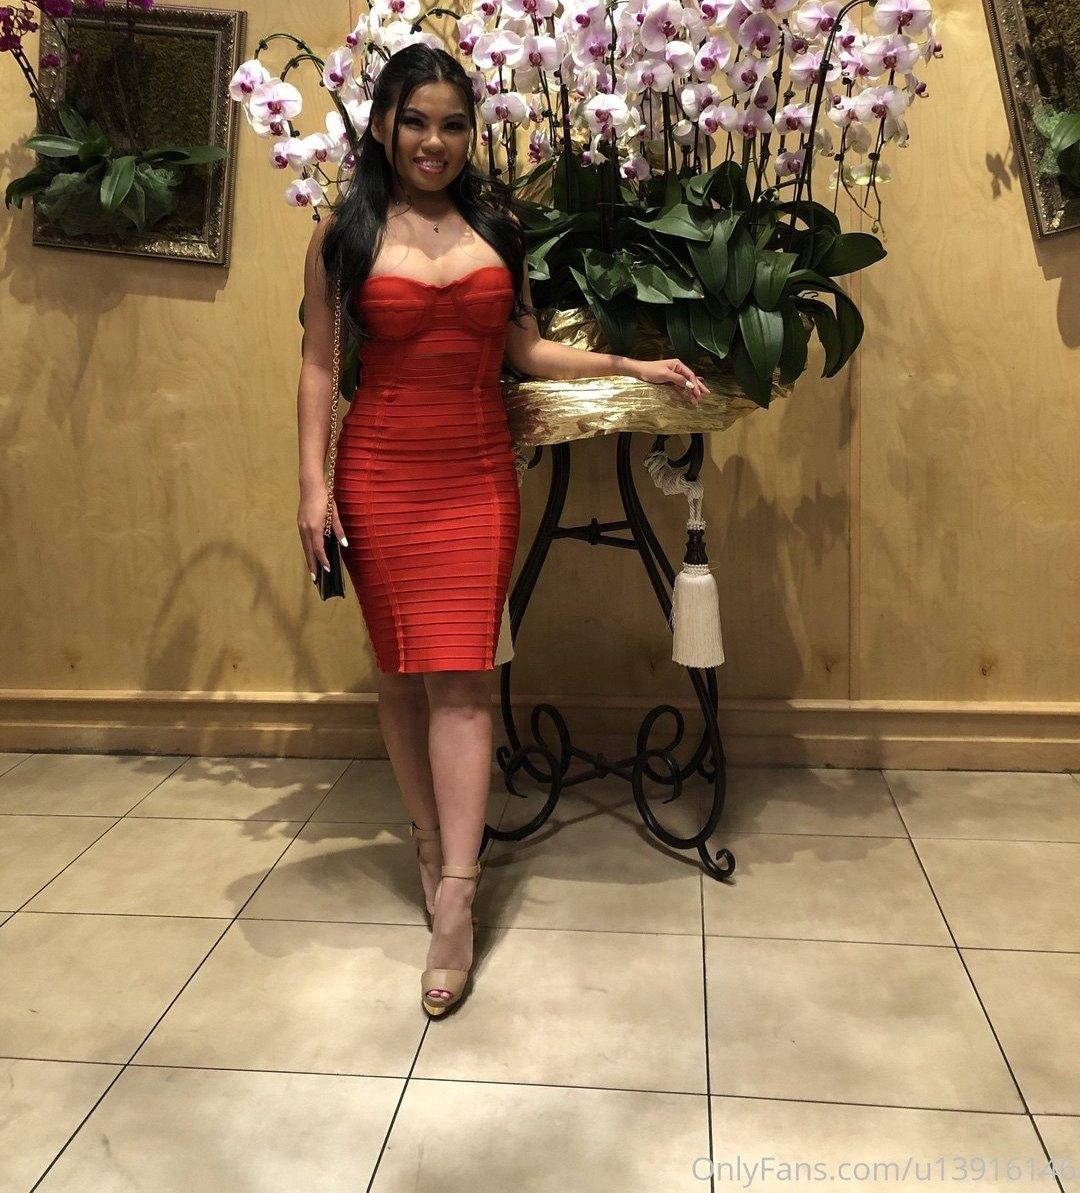 Cindy Starfall Clubstarfall Onlyfans Sexy Leaks 0011